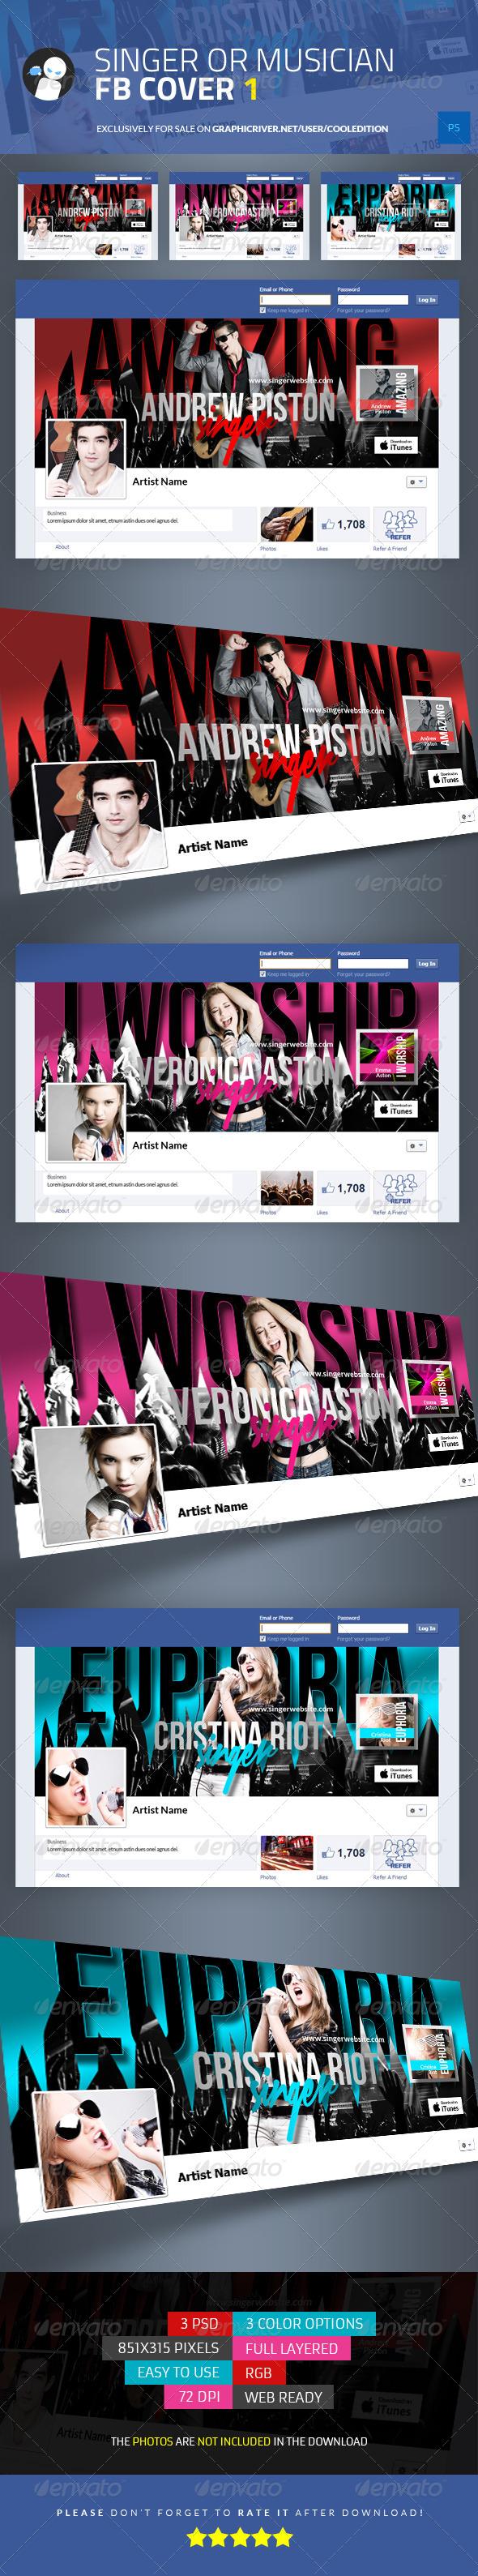 Singer or Musician Facebook Cover 1